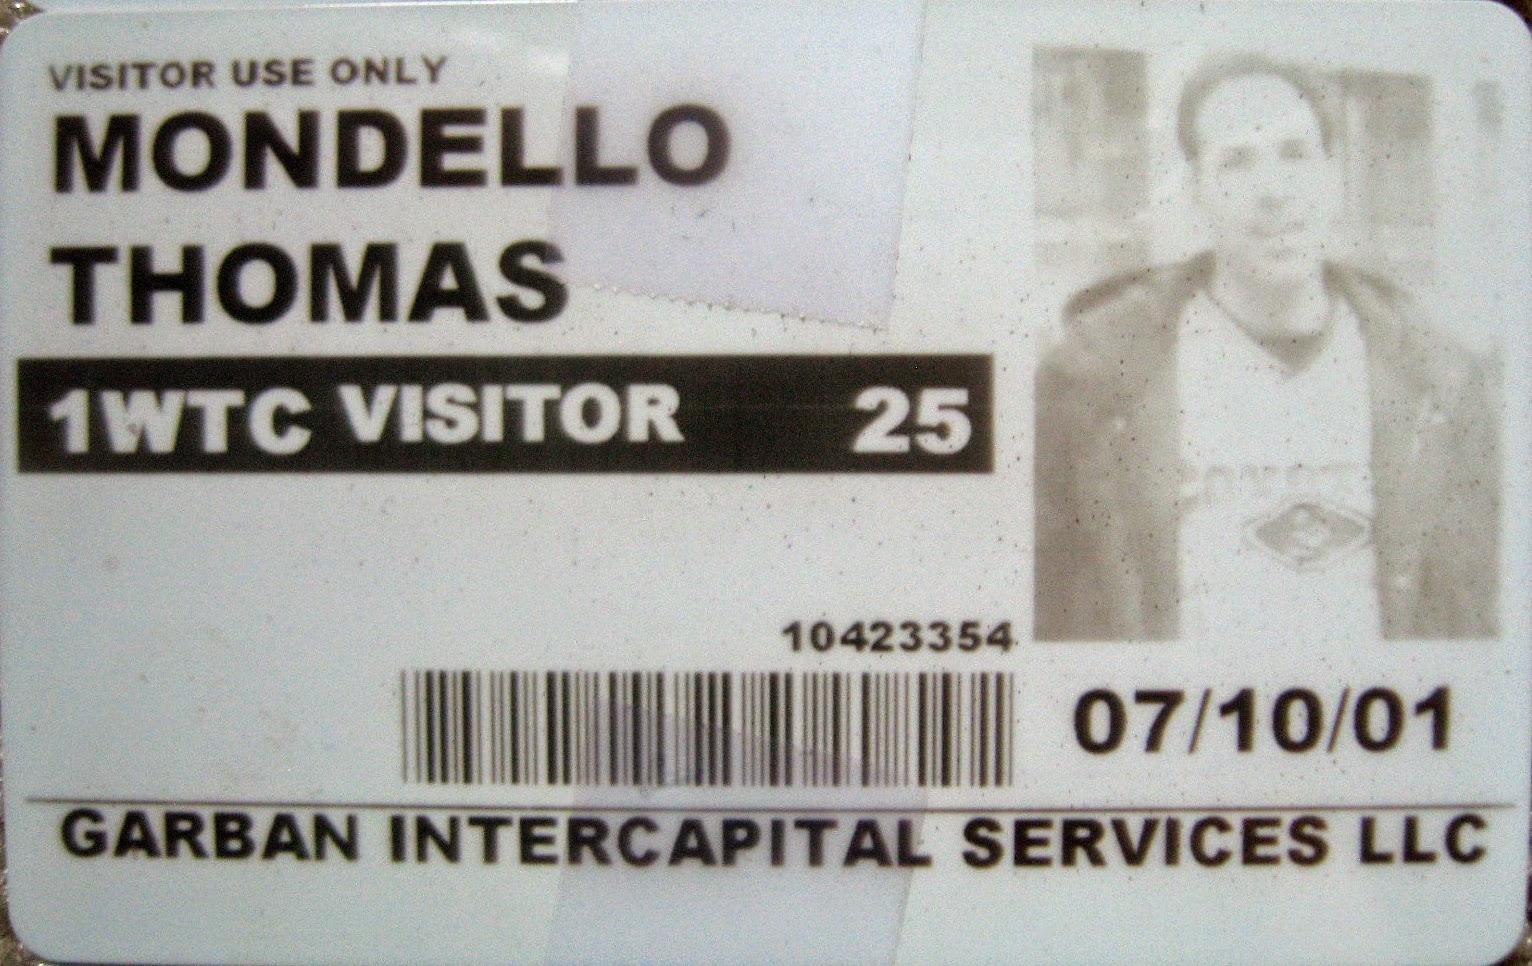 Tommy Mondello World Trade Center pass July 10, 2001